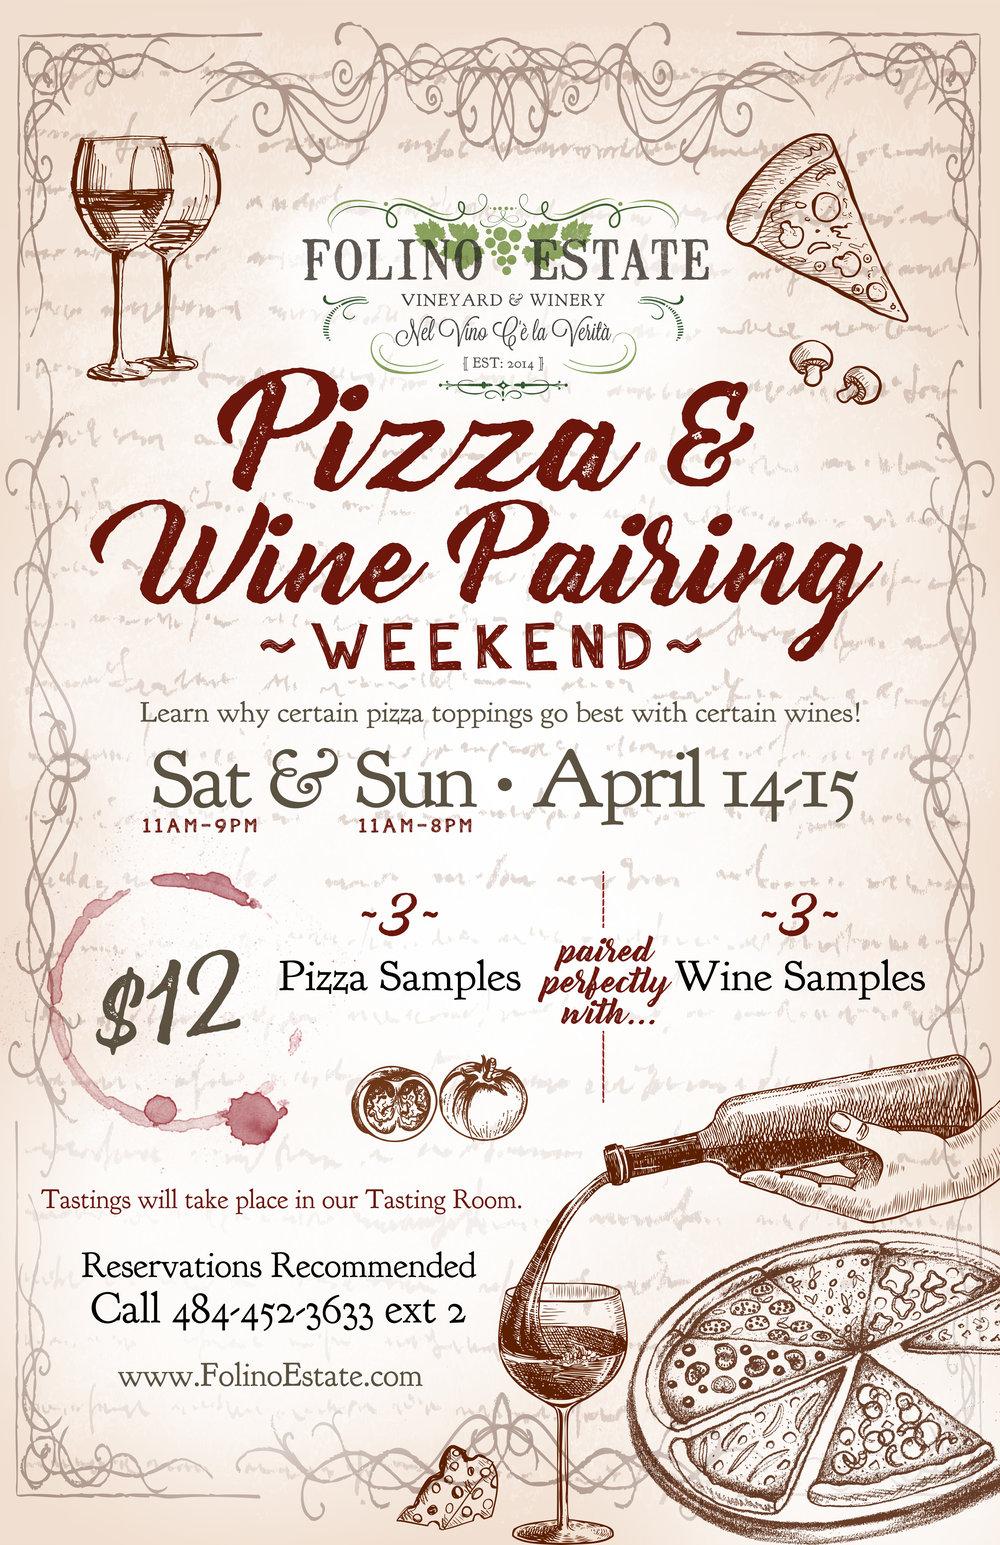 PizzaWineParing.jpg